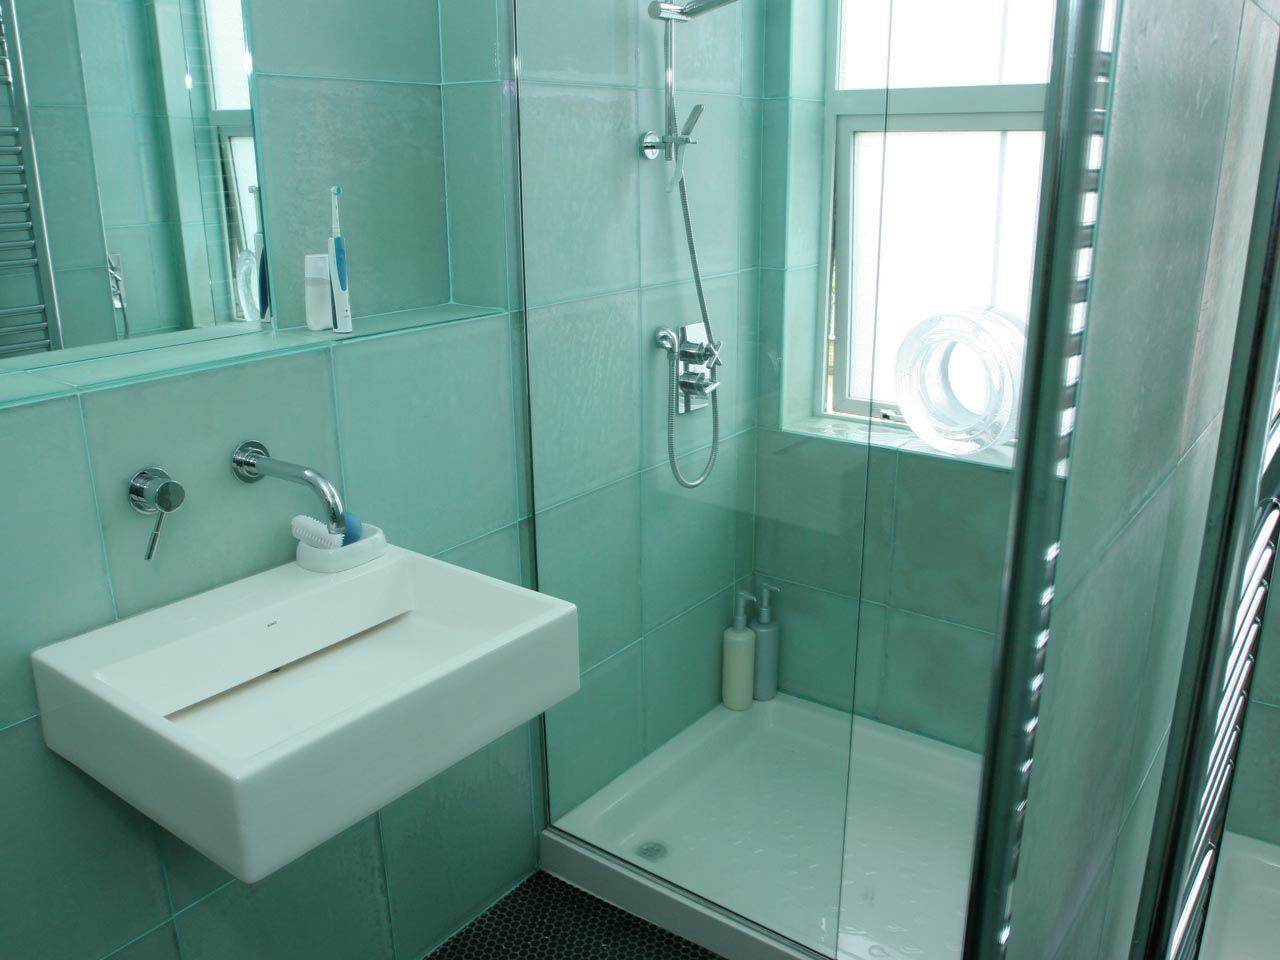 Eryka Isaak - Iridescent Bathroom Tiles | My new place!! | Pinterest ...